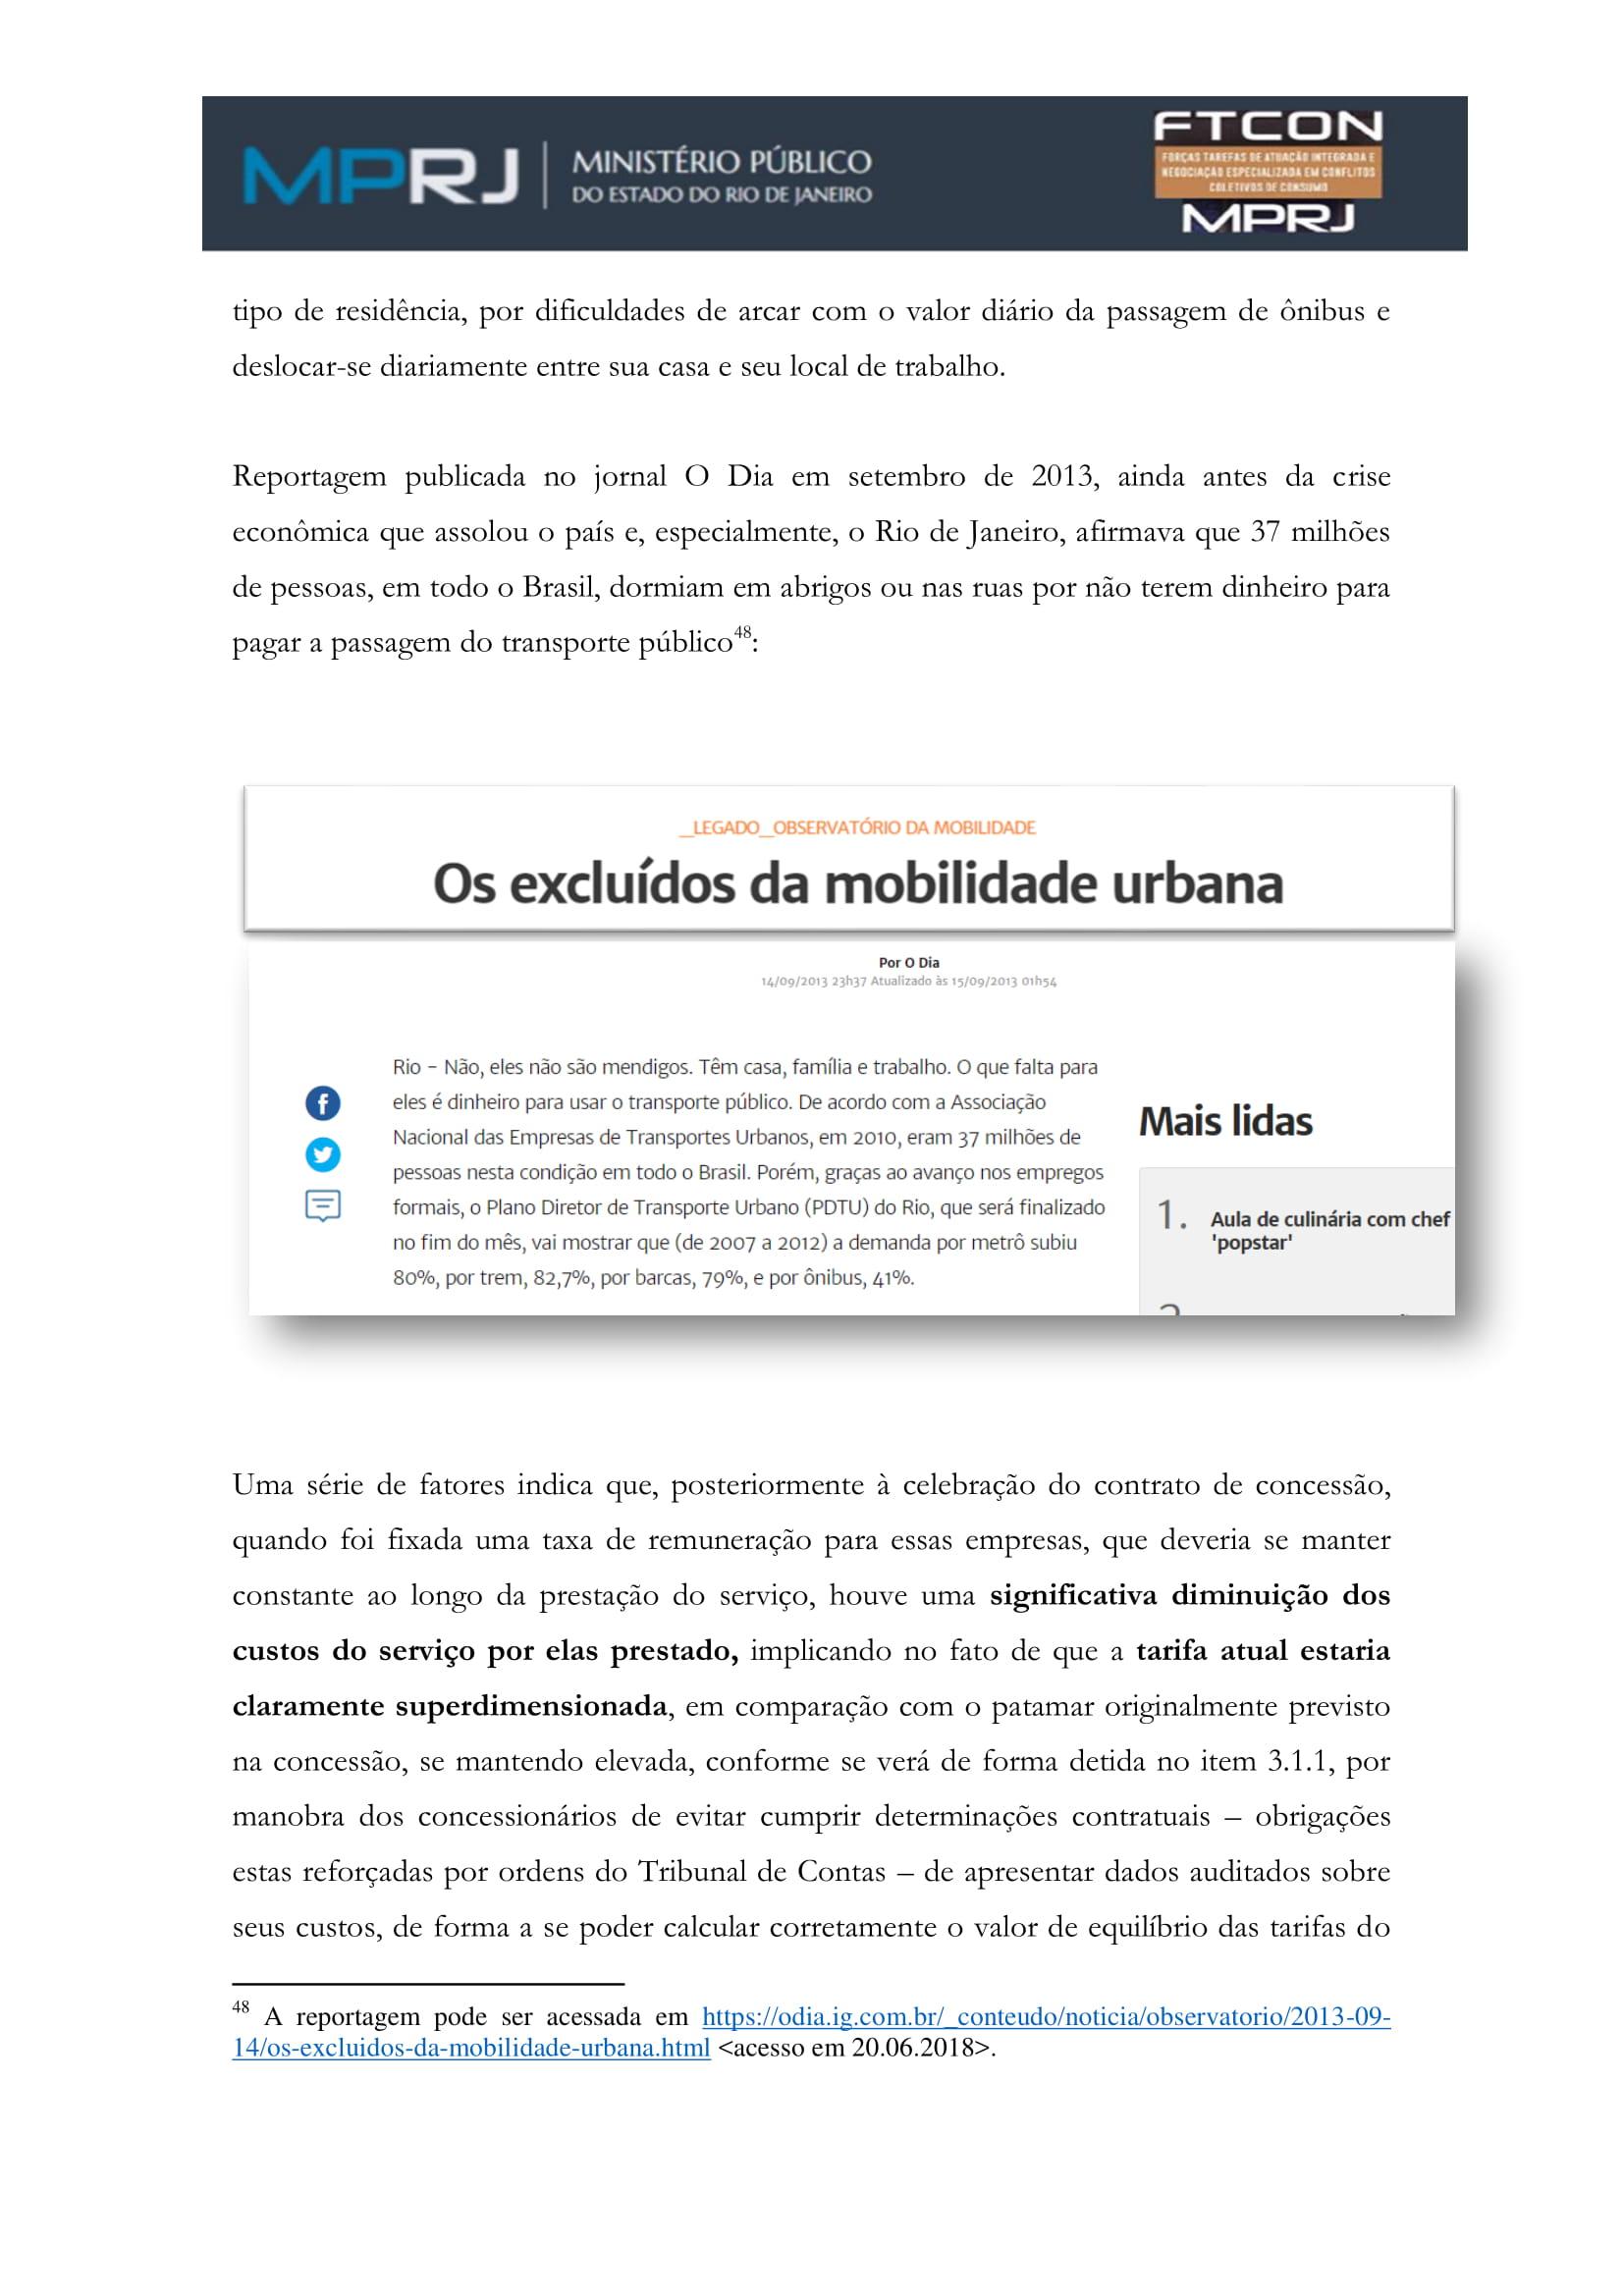 acp_caducidade_onibus_dr_rt-065